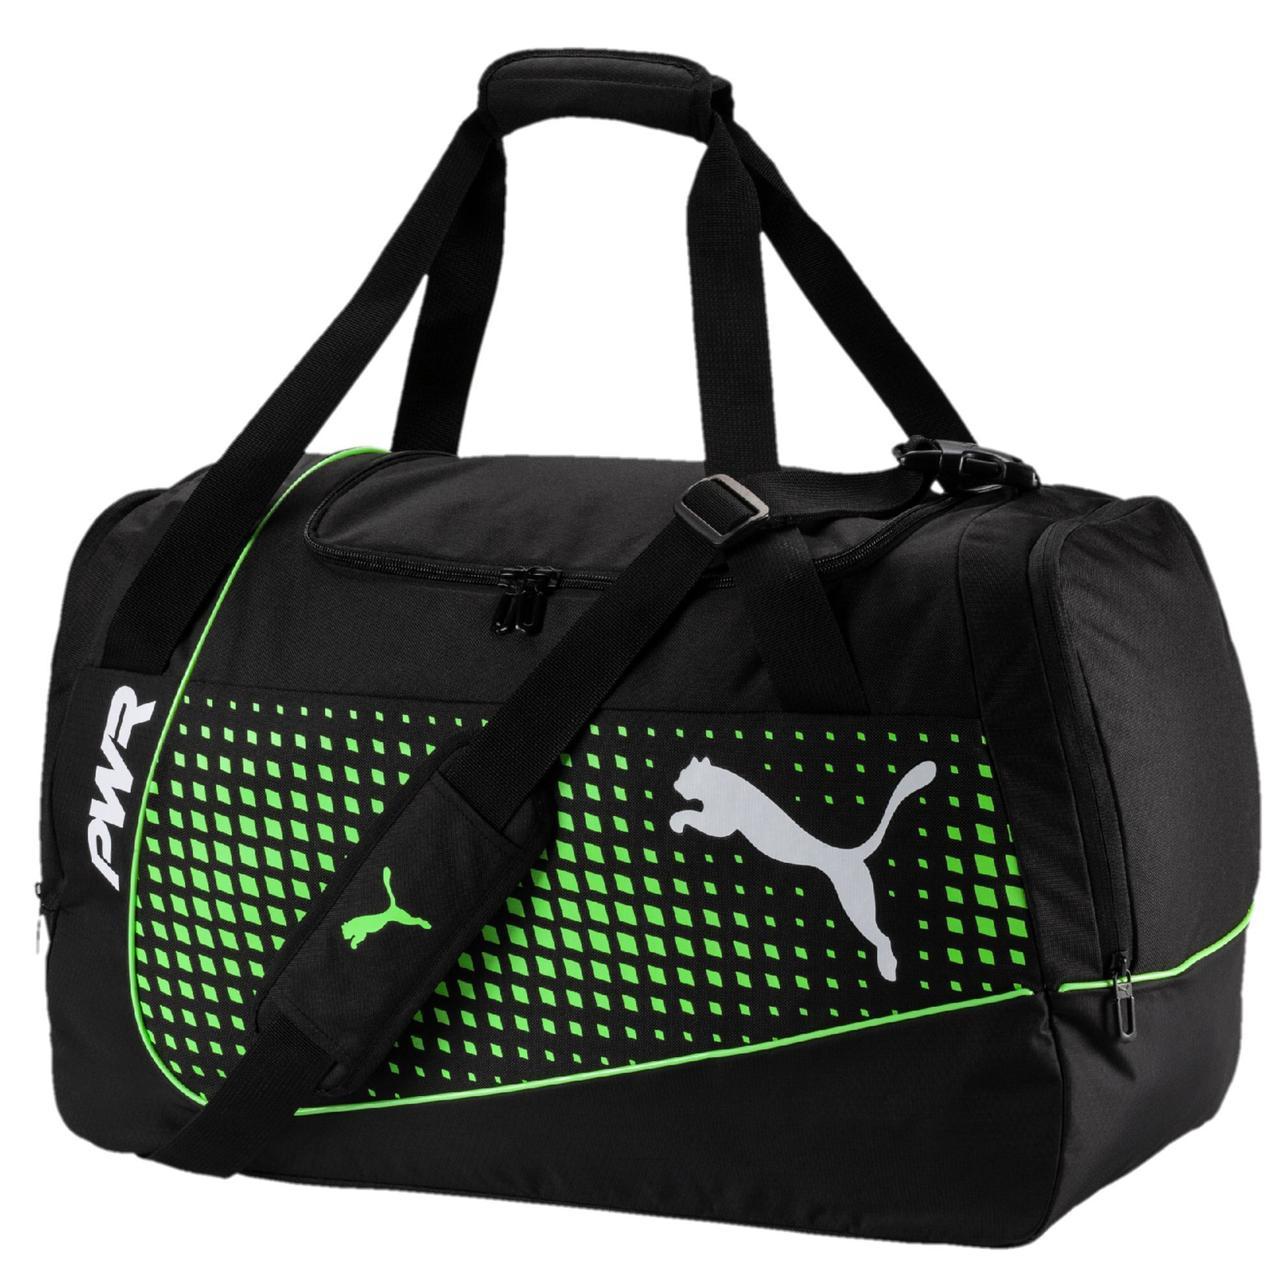 72cf73b2e12d Спортивная сумка Puma EVOPOWER - Спортивный интернет-магазин